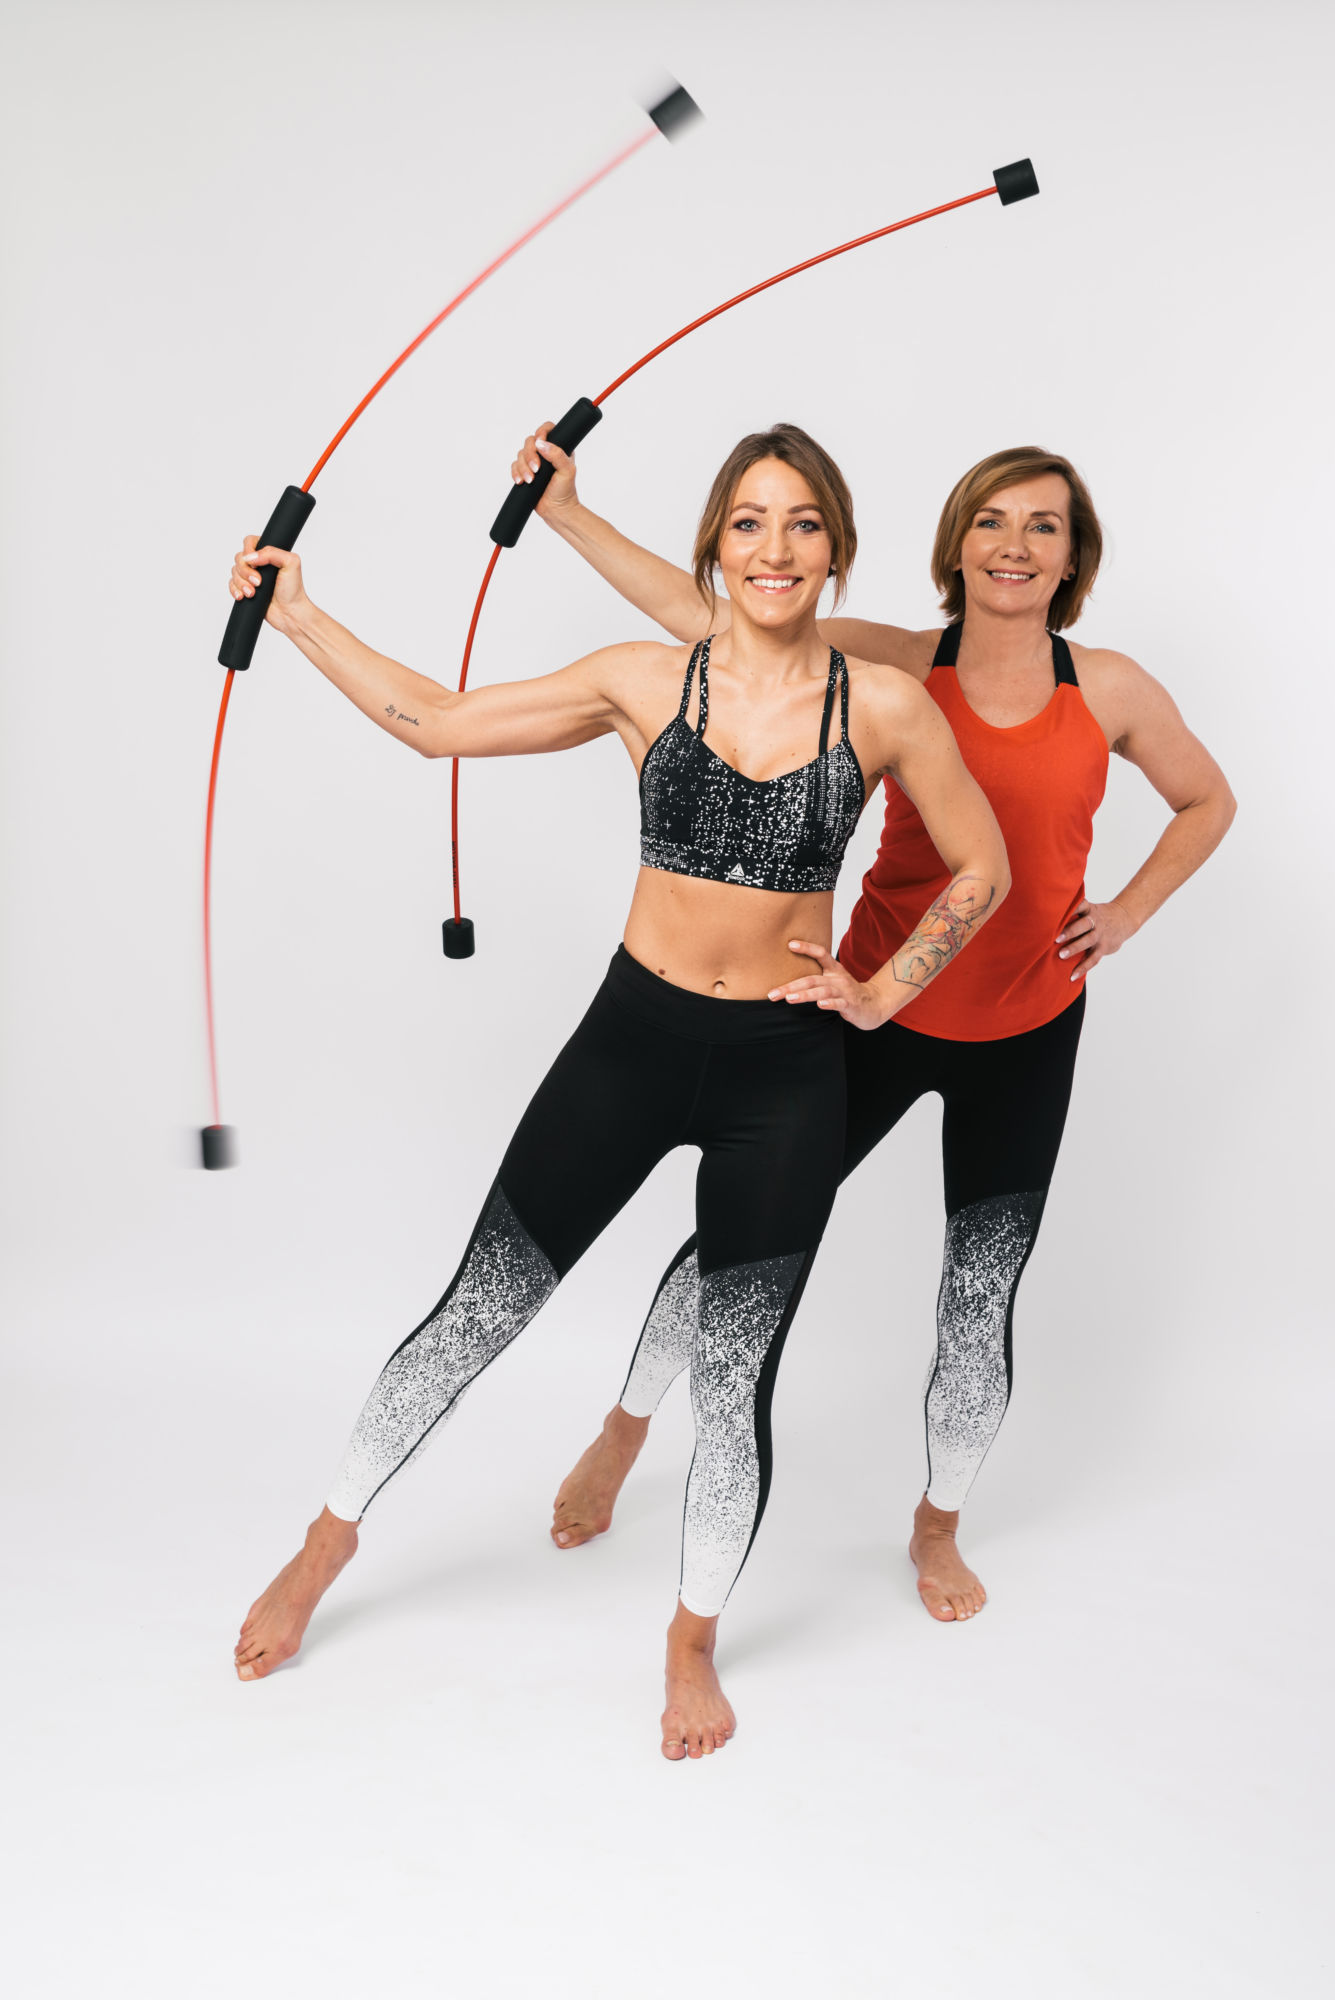 FitPainFree-cviceni-exercise-fitness-egoscue-method-education-akreditovane-skoleni-vzdelavani-ceskarepublika-praha-brno-bezbolesti-nopain-jendoduche-izolovane-cviceni-hana-toufarova-lektor-rehabilitace-fyzioterapie-flexibar